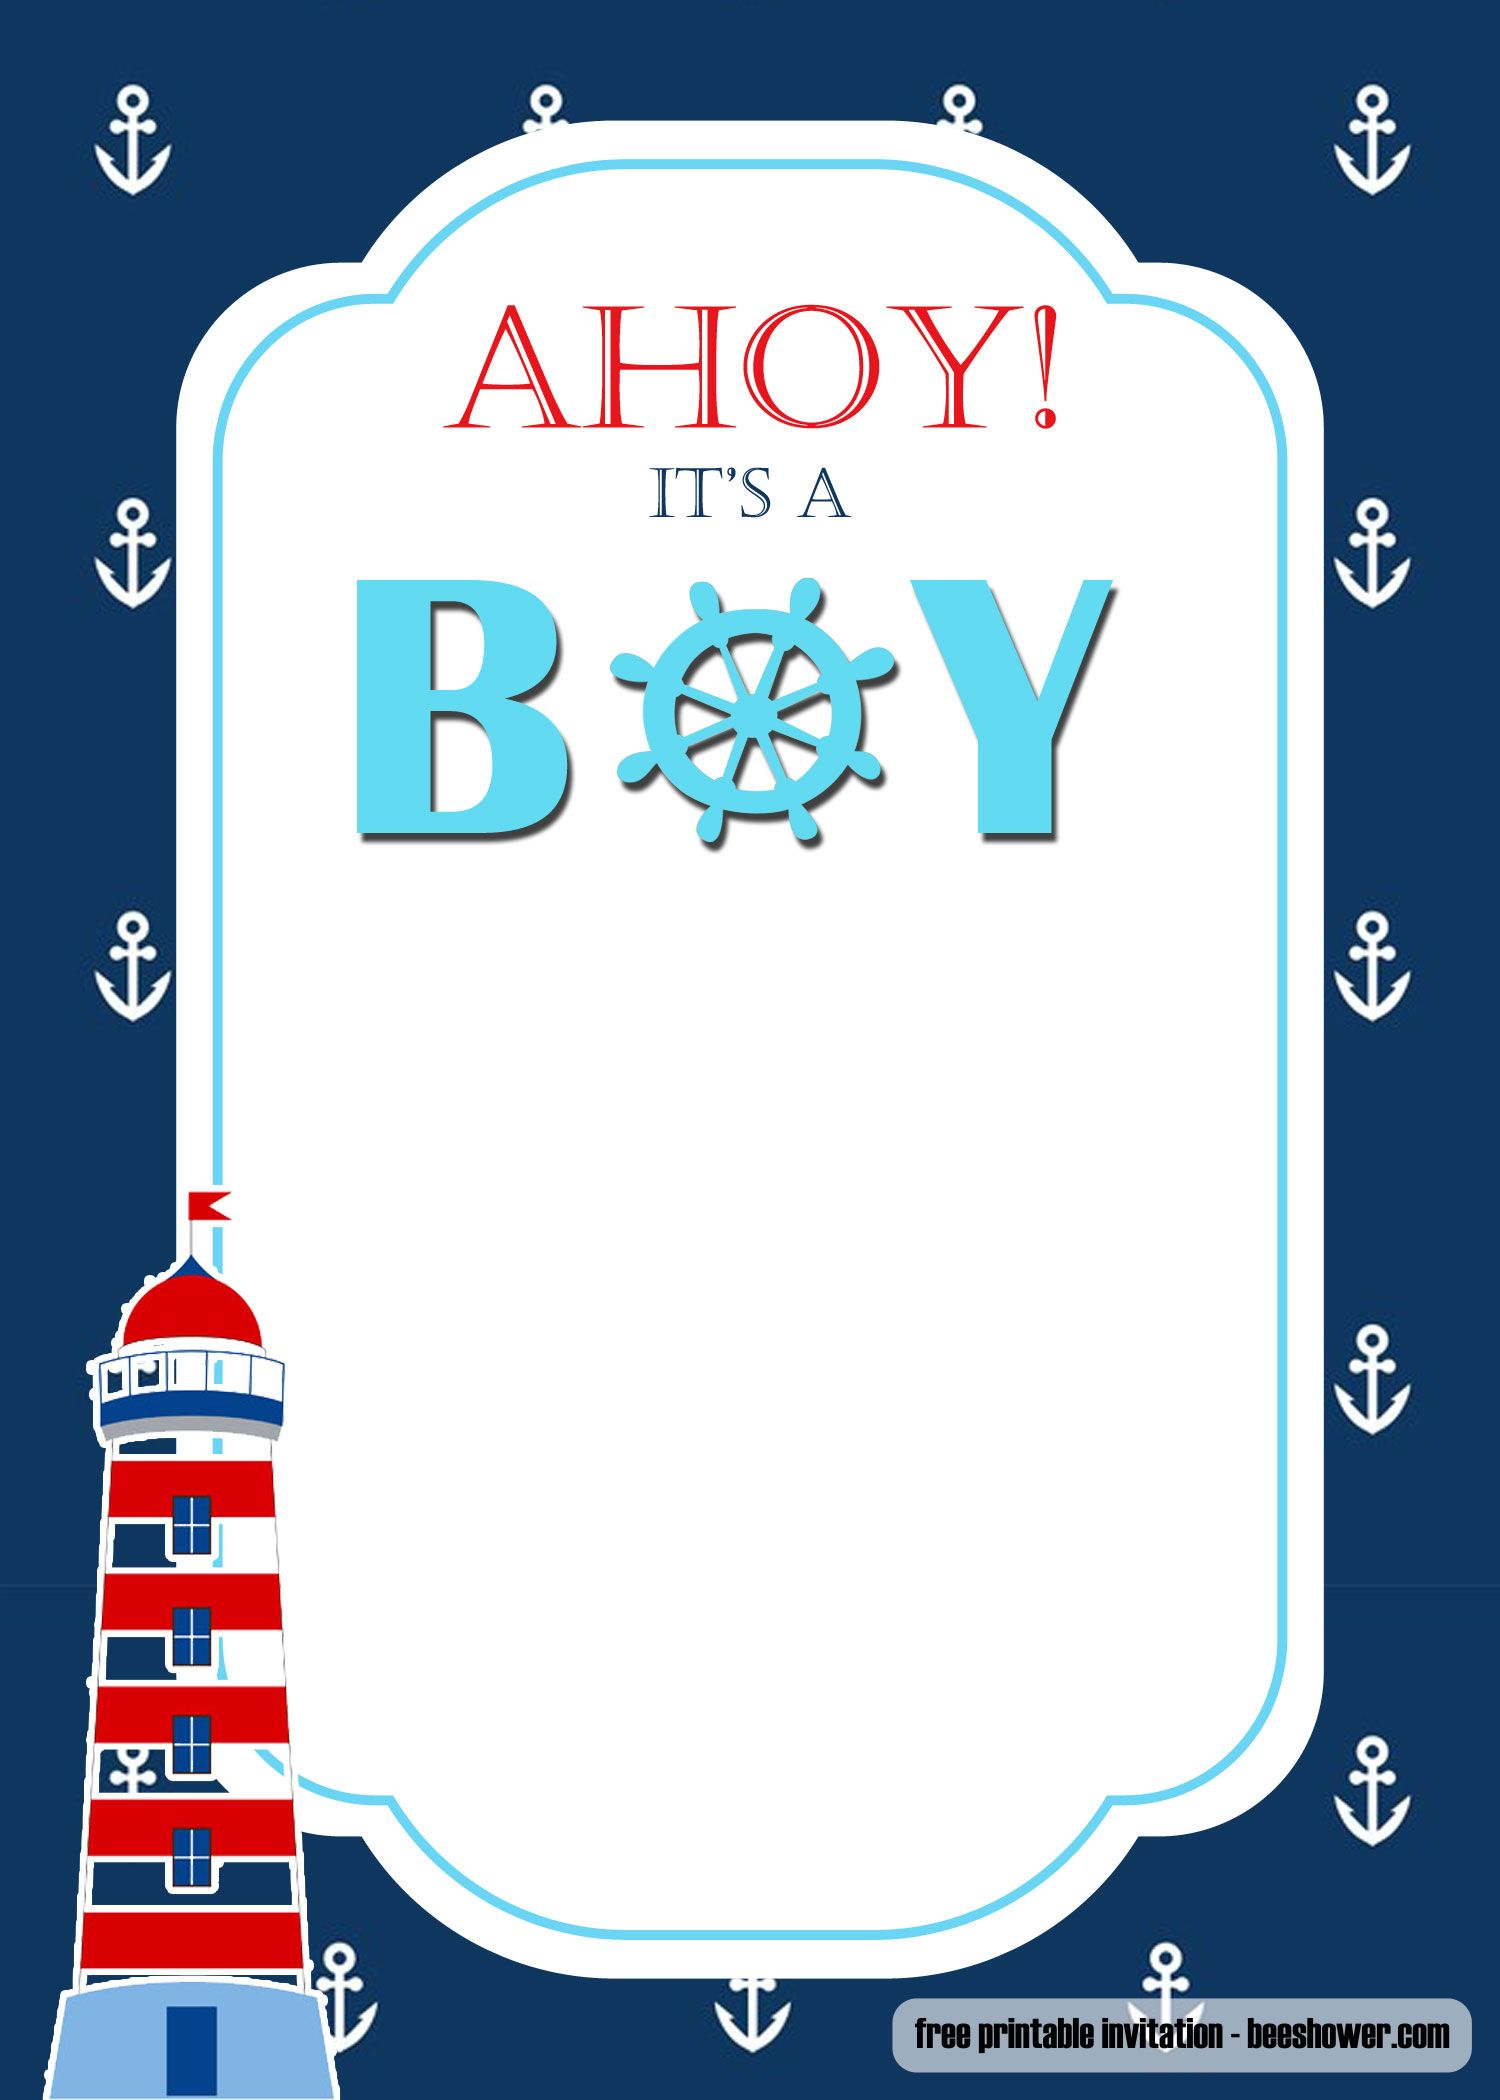 Free Nautical Themed Baby Shower Invitations Templates Fre Baby Shower Nautical Theme Nautical Baby Shower Invitations Free Printable Baby Shower Invitations